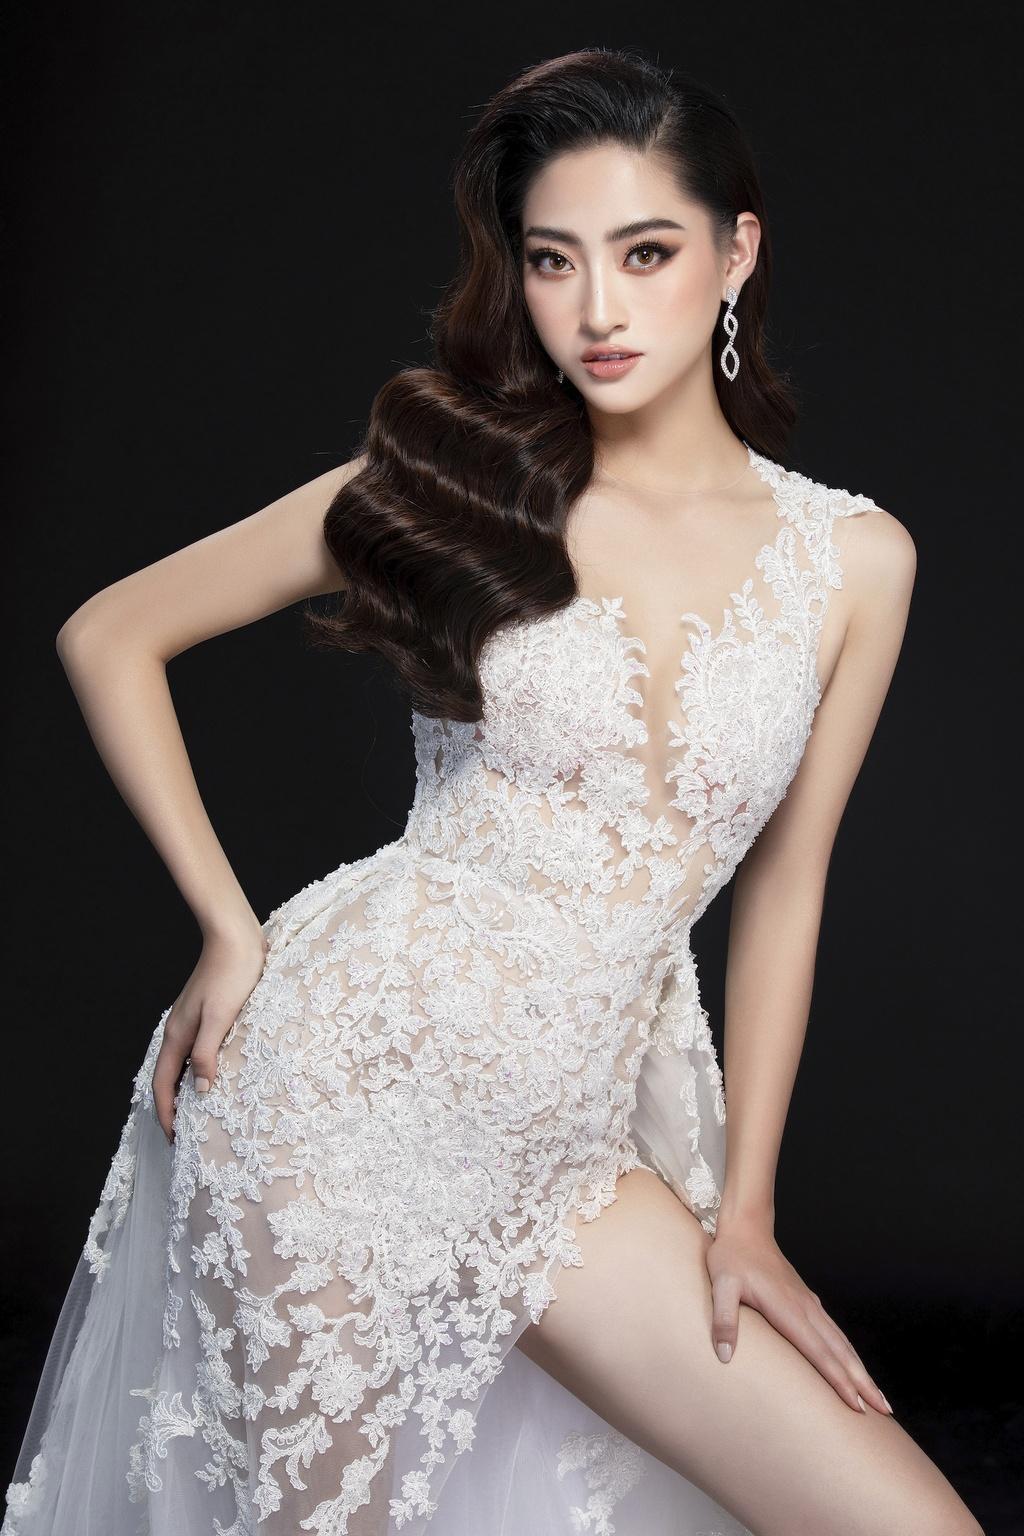 Luong Thuy Linh mac vay xe cao khoe chan 1,22 m o chung ket Miss World hinh anh 8 null